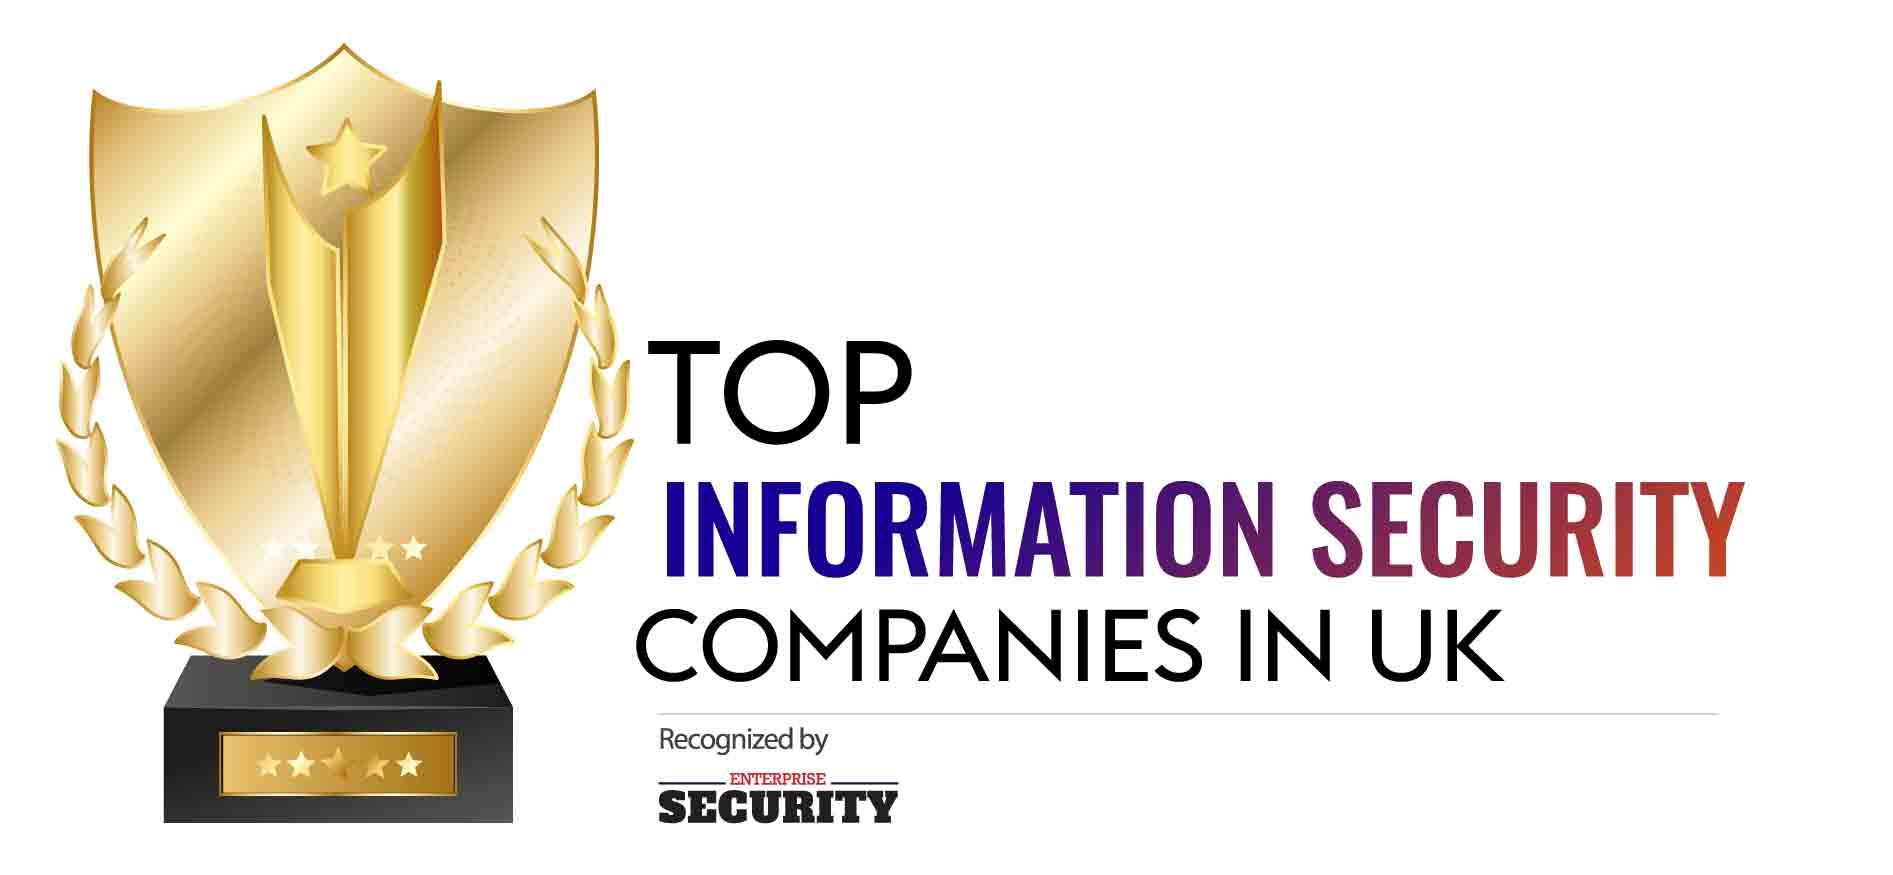 Top 10 Information Security Companies in UK – 2020